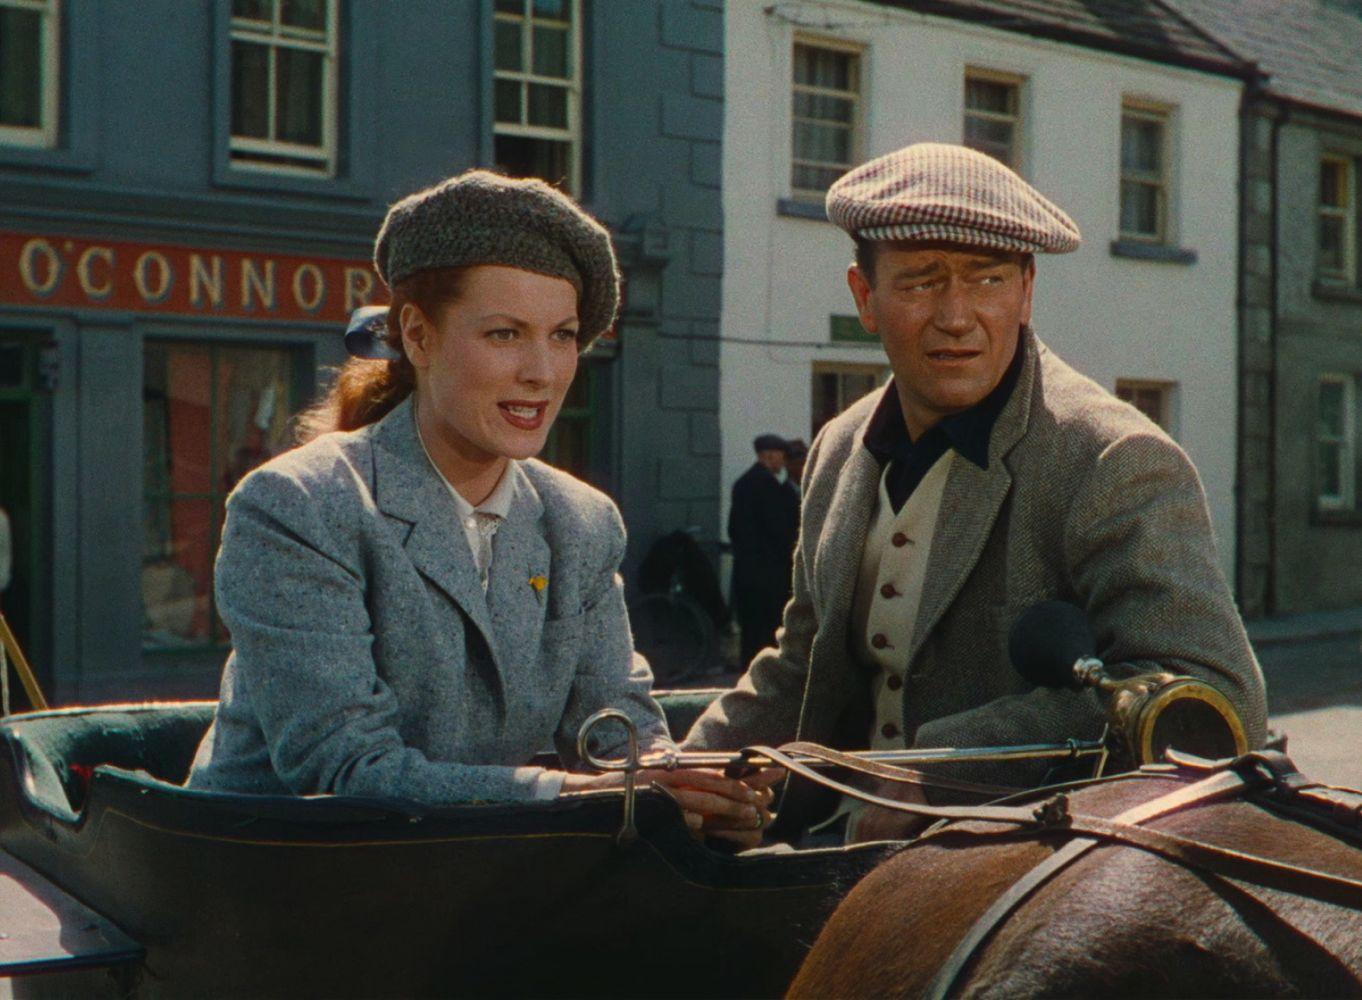 John Wayne and Maureen O'Hara in The Quiet Man 1952